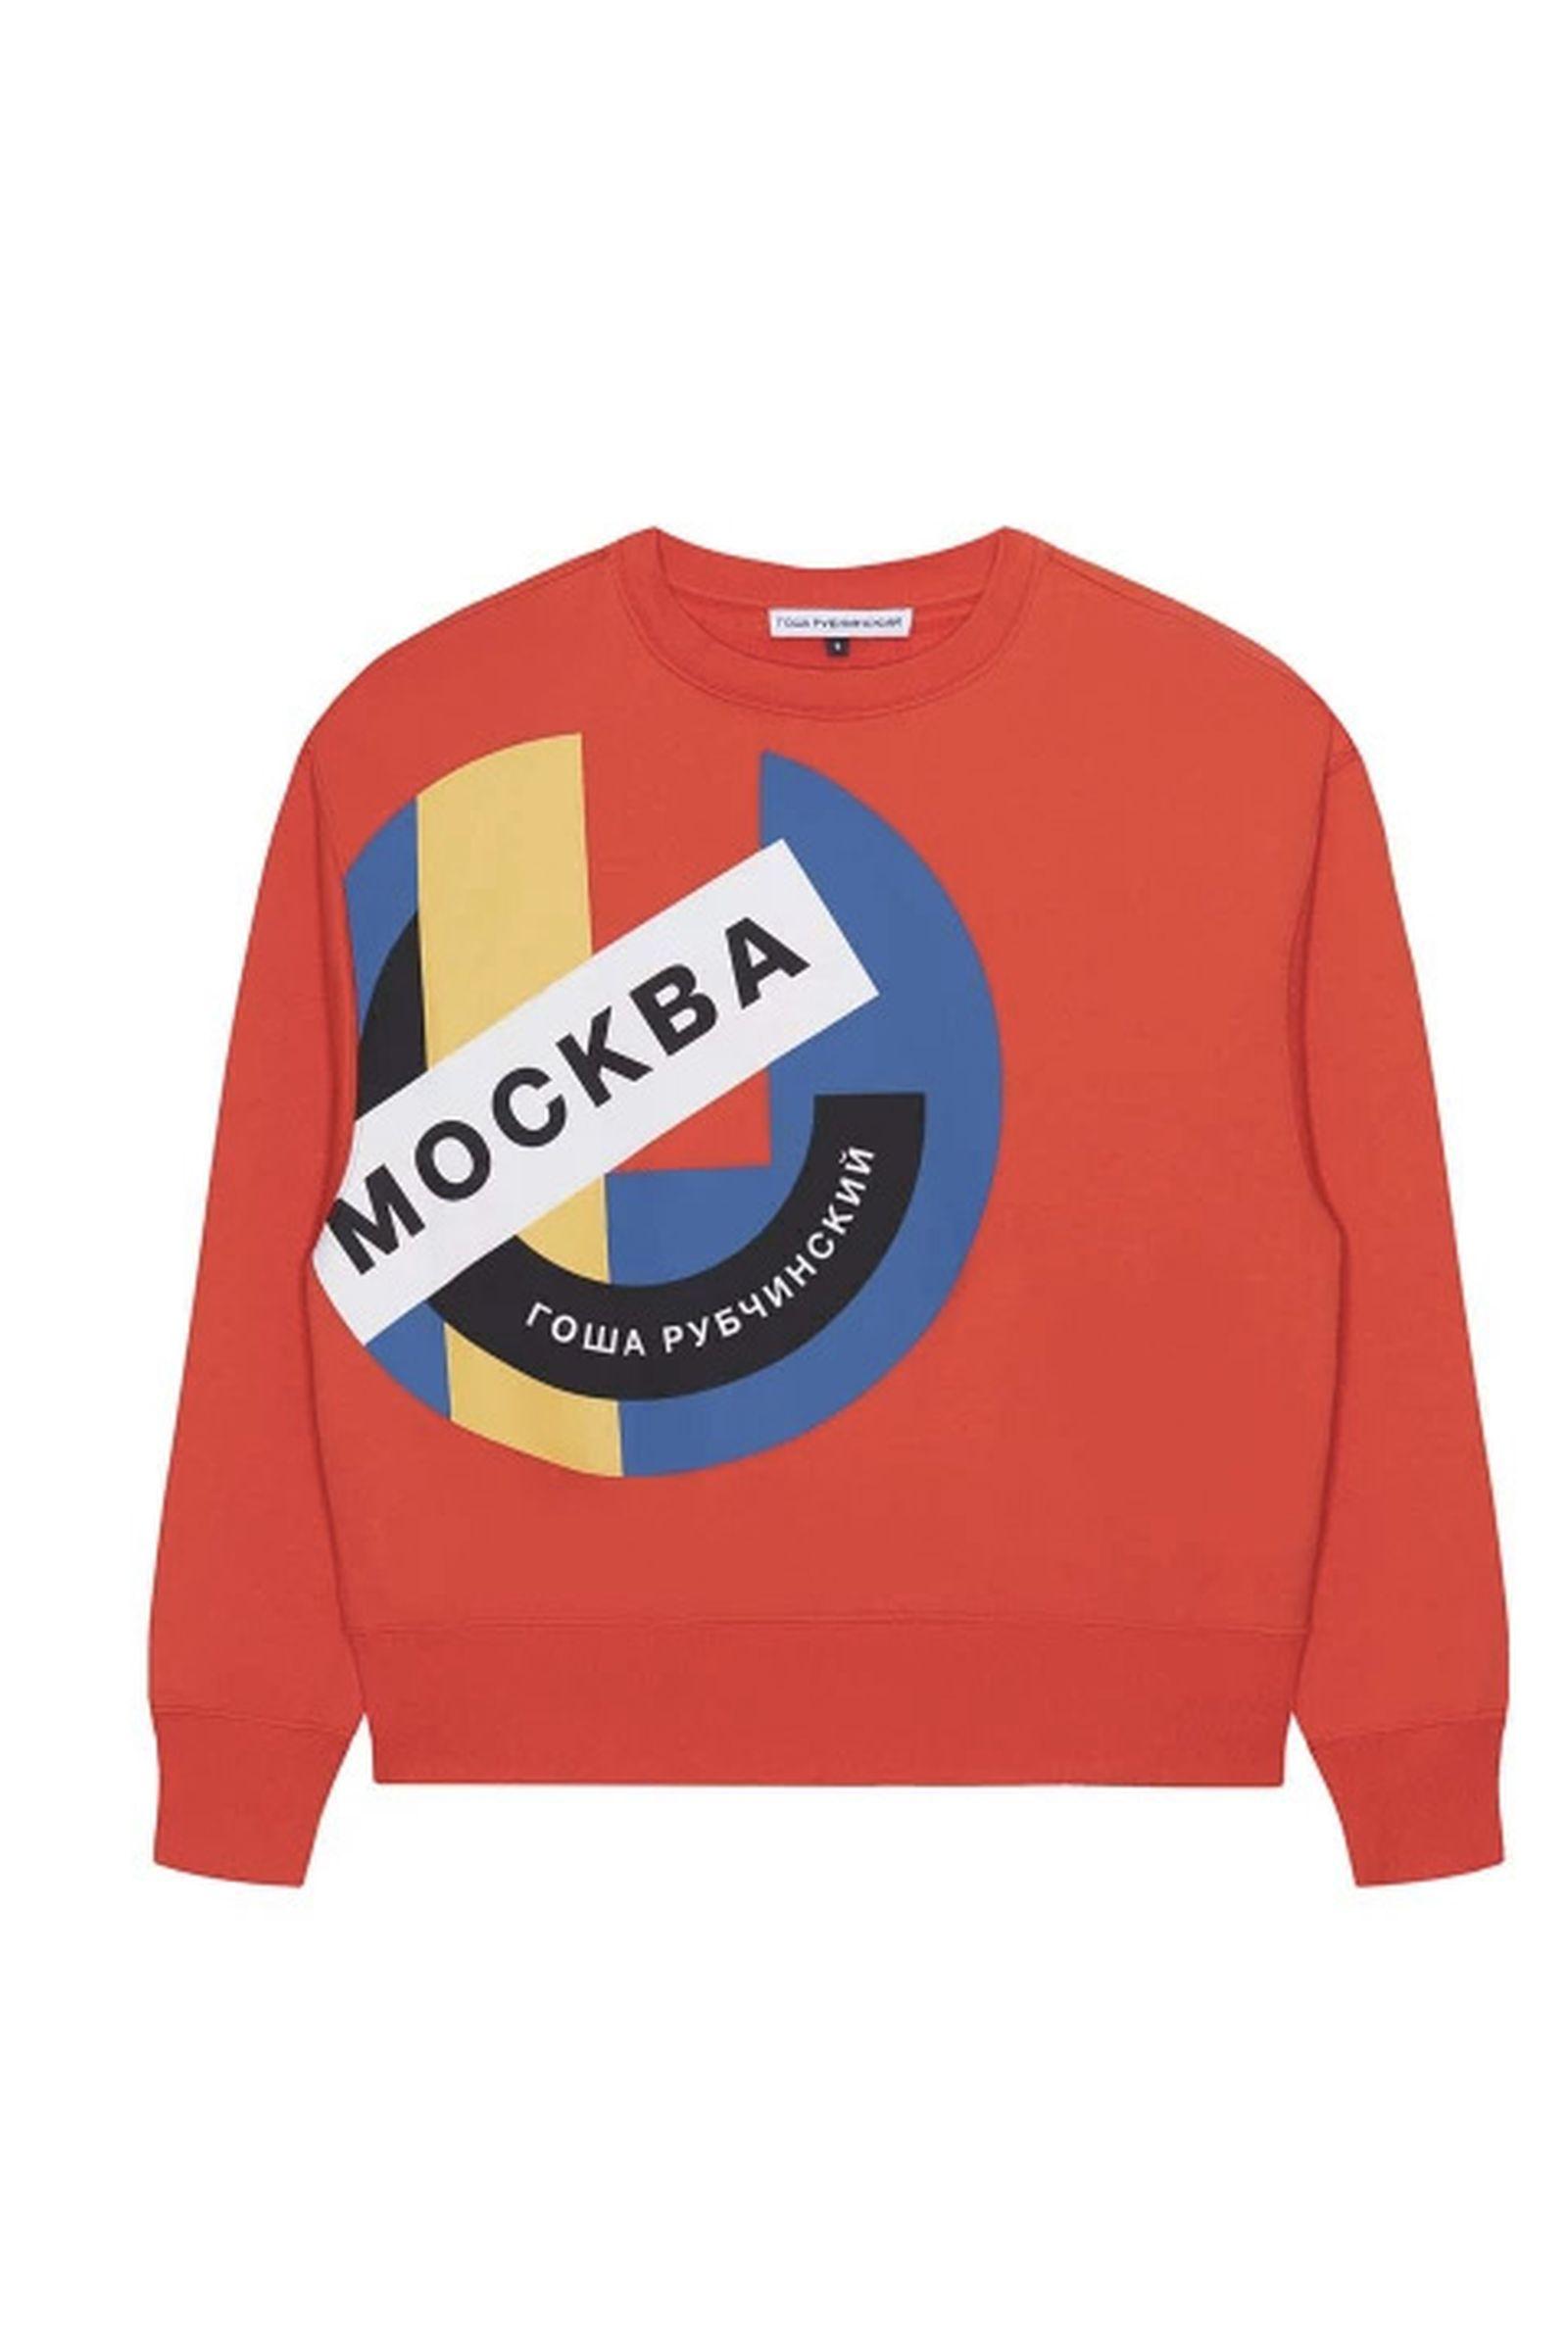 gosha rubchinskiy adidas world cup collection 2018 FIFA World Cup Gosha Rubchinskiy x adidas World Cup 2018